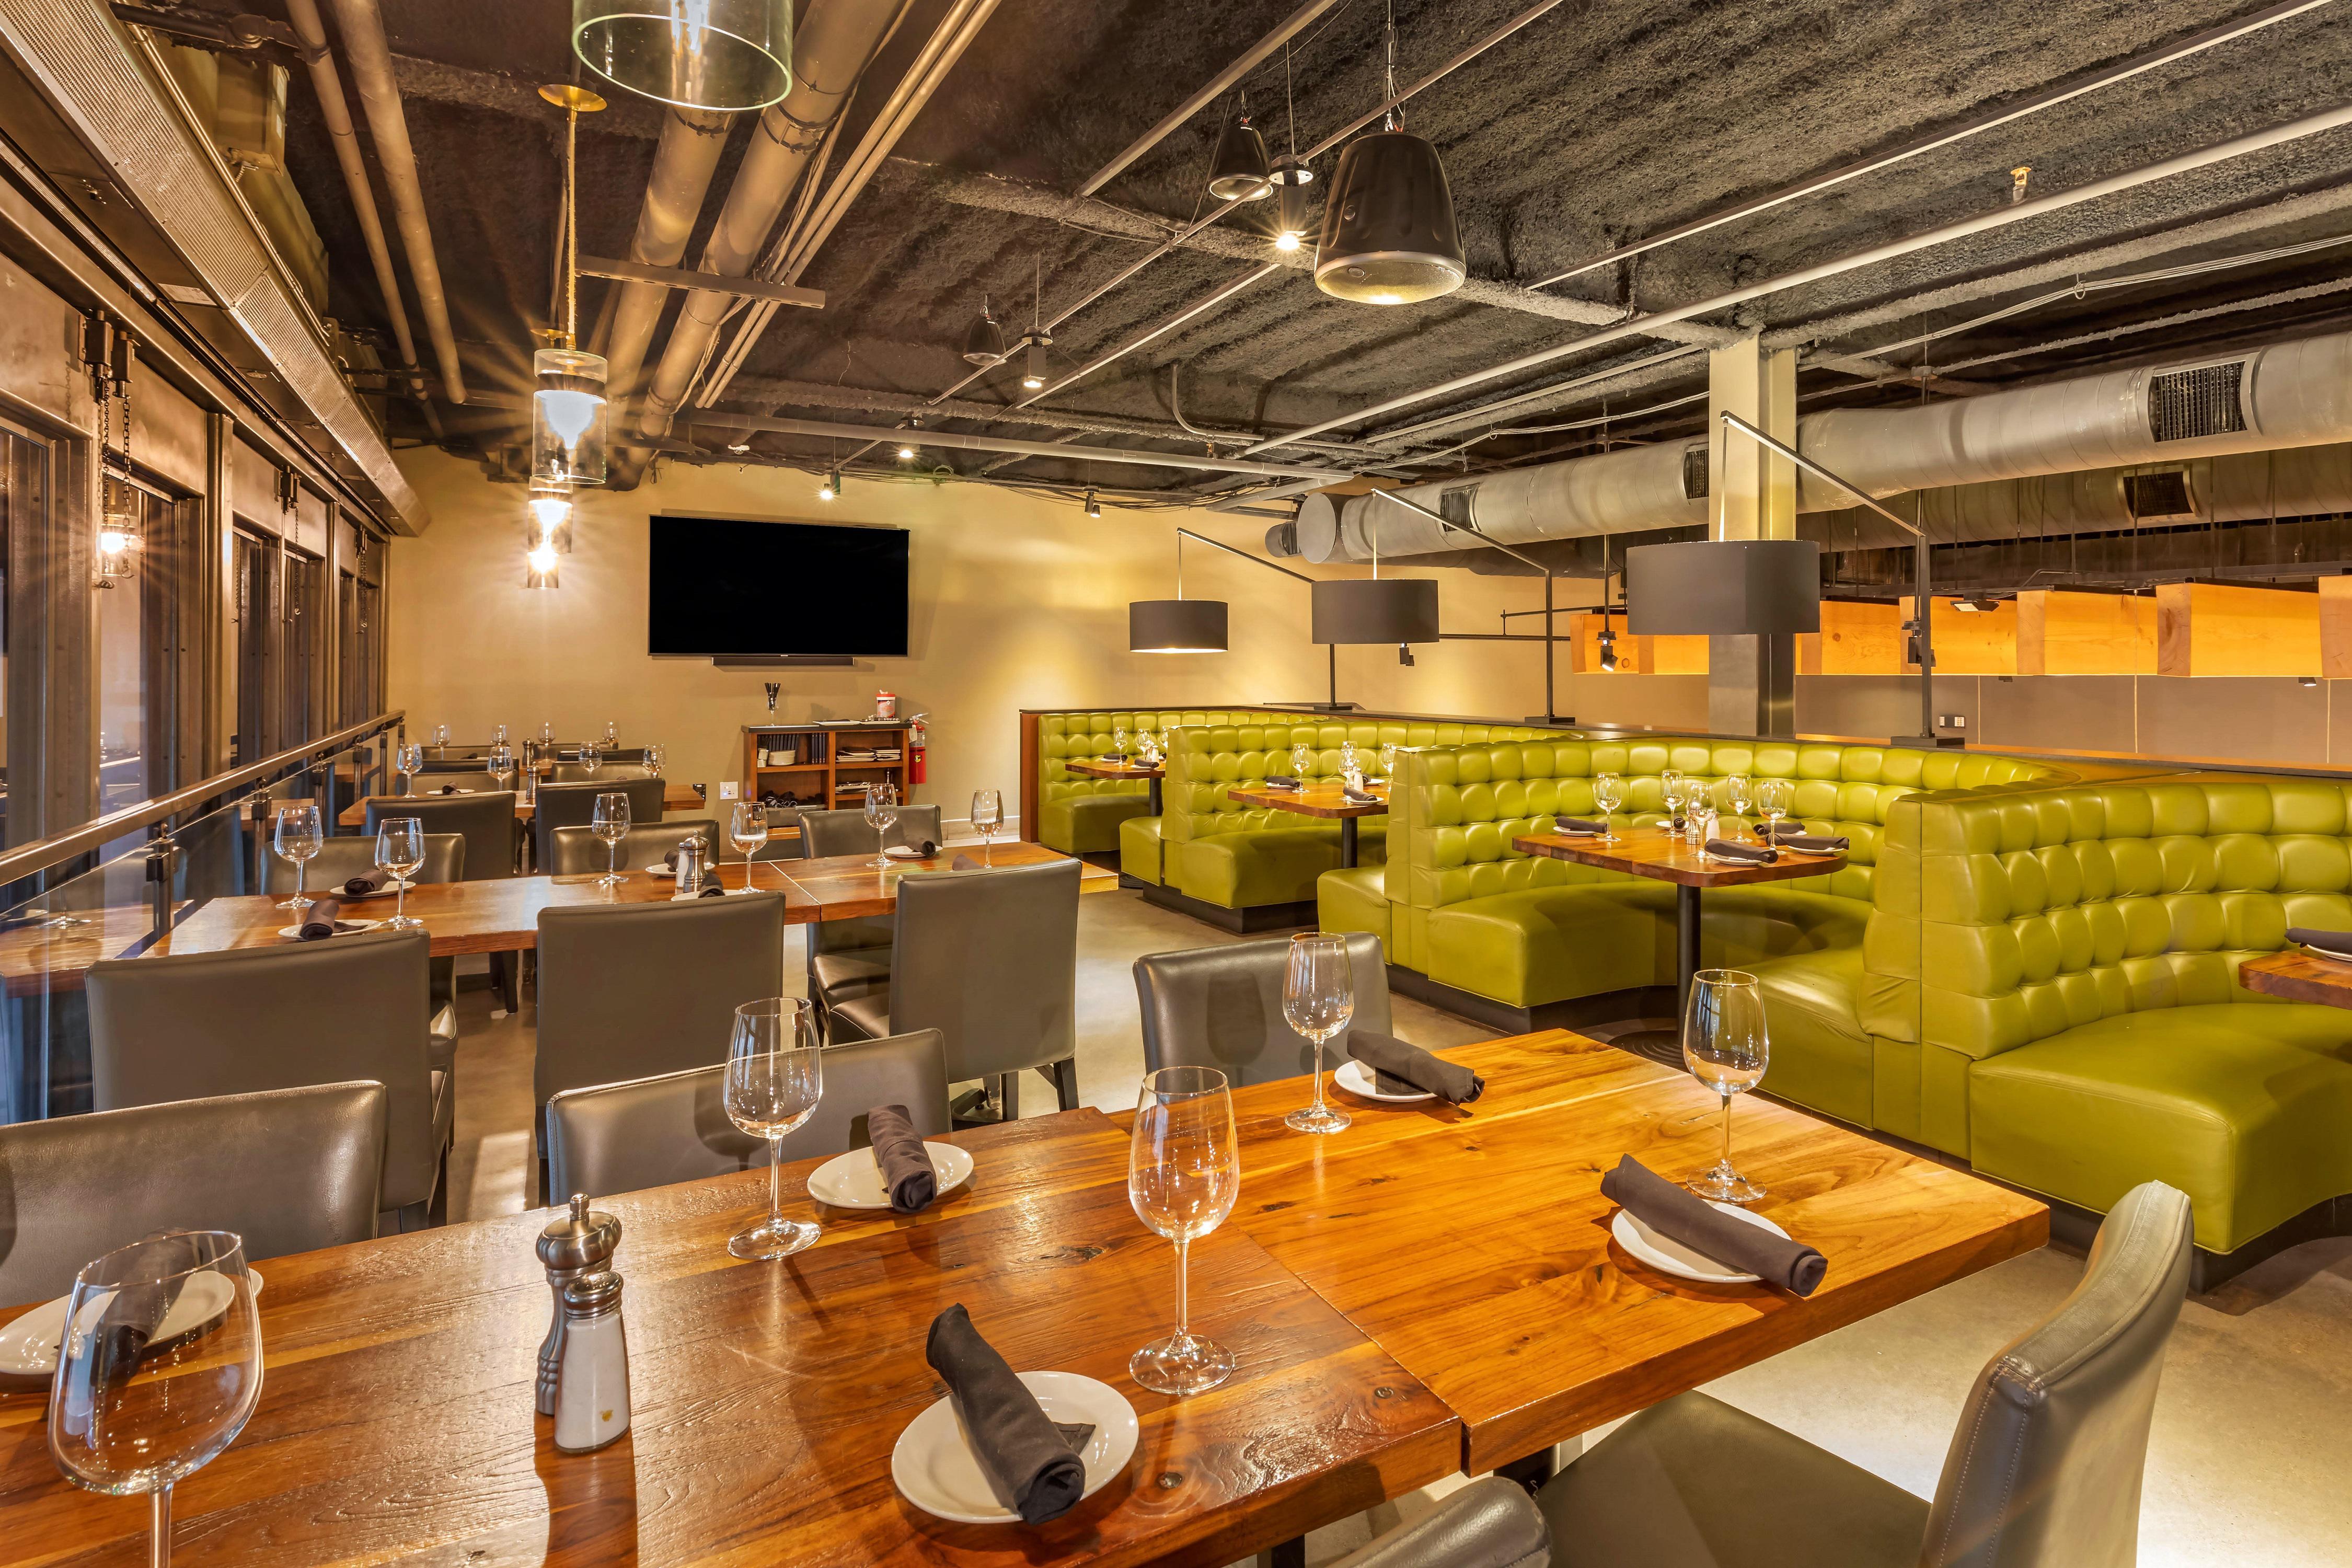 Del Frisco's Grille Plano Mezzanine group dining room